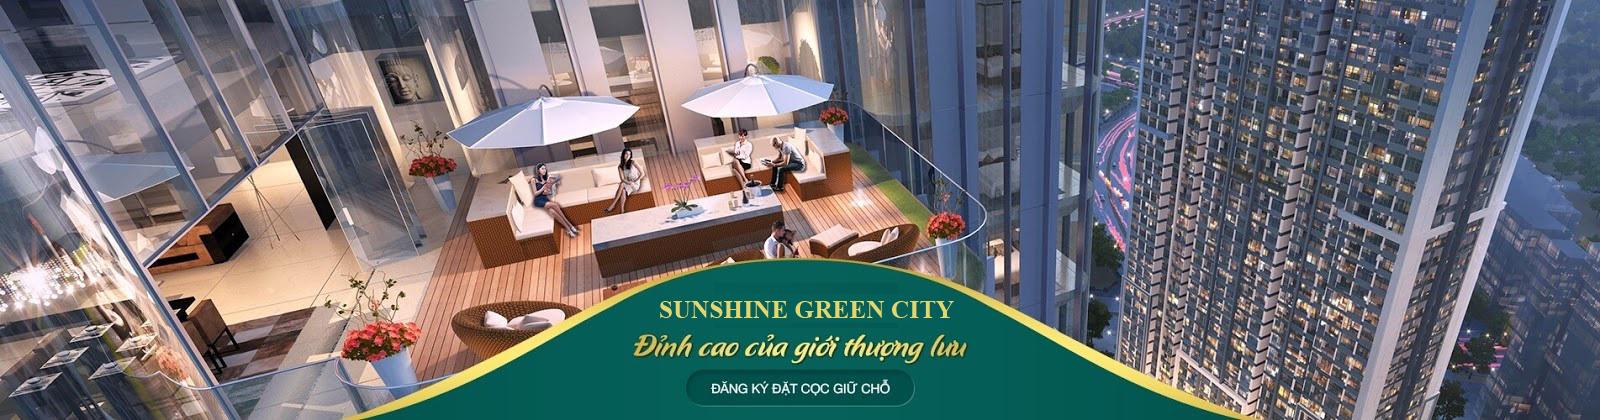 slider_bg_plane_Chung cư Sunshine Green City